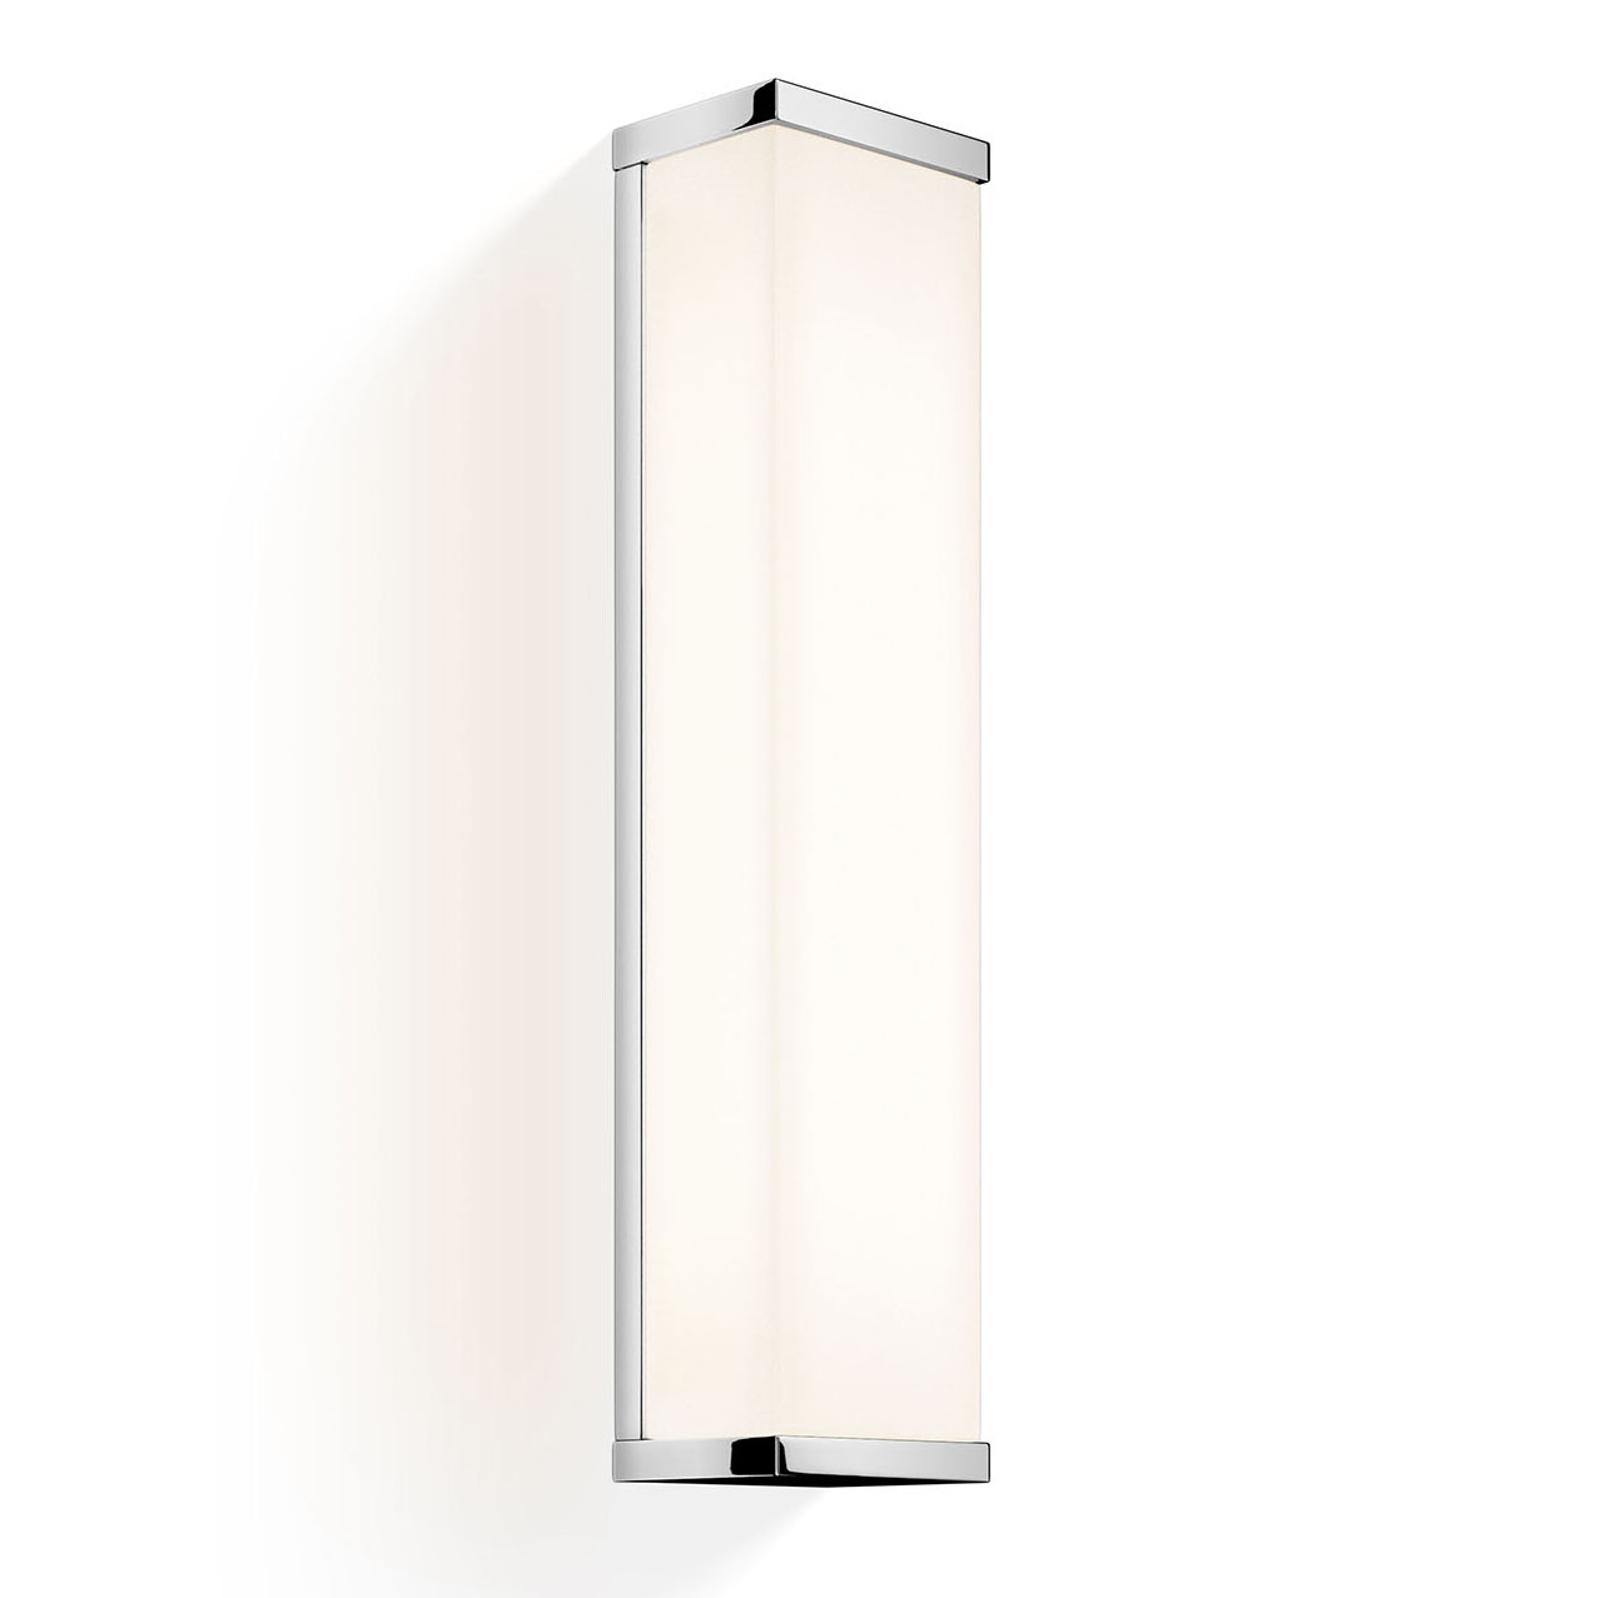 Decor Walther Manhattan 40 N LED wandlamp chroom